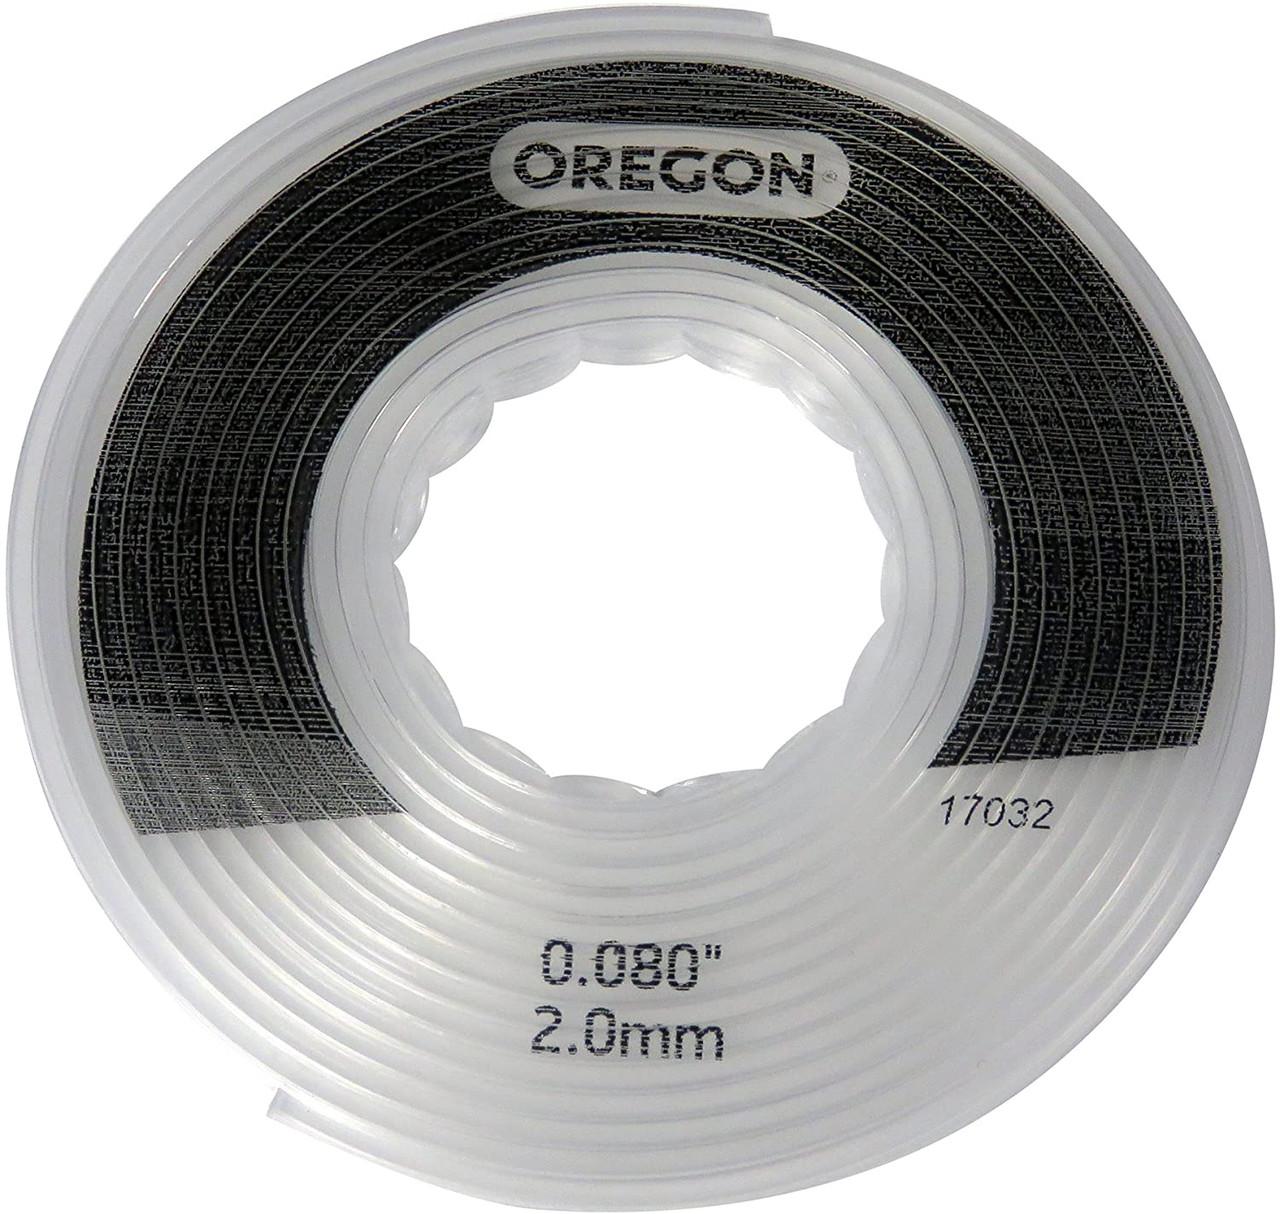 "Oregon 24-280-25 Gator SpeedLoad Small Disc .080"" Trimmer line, 25-Pack"